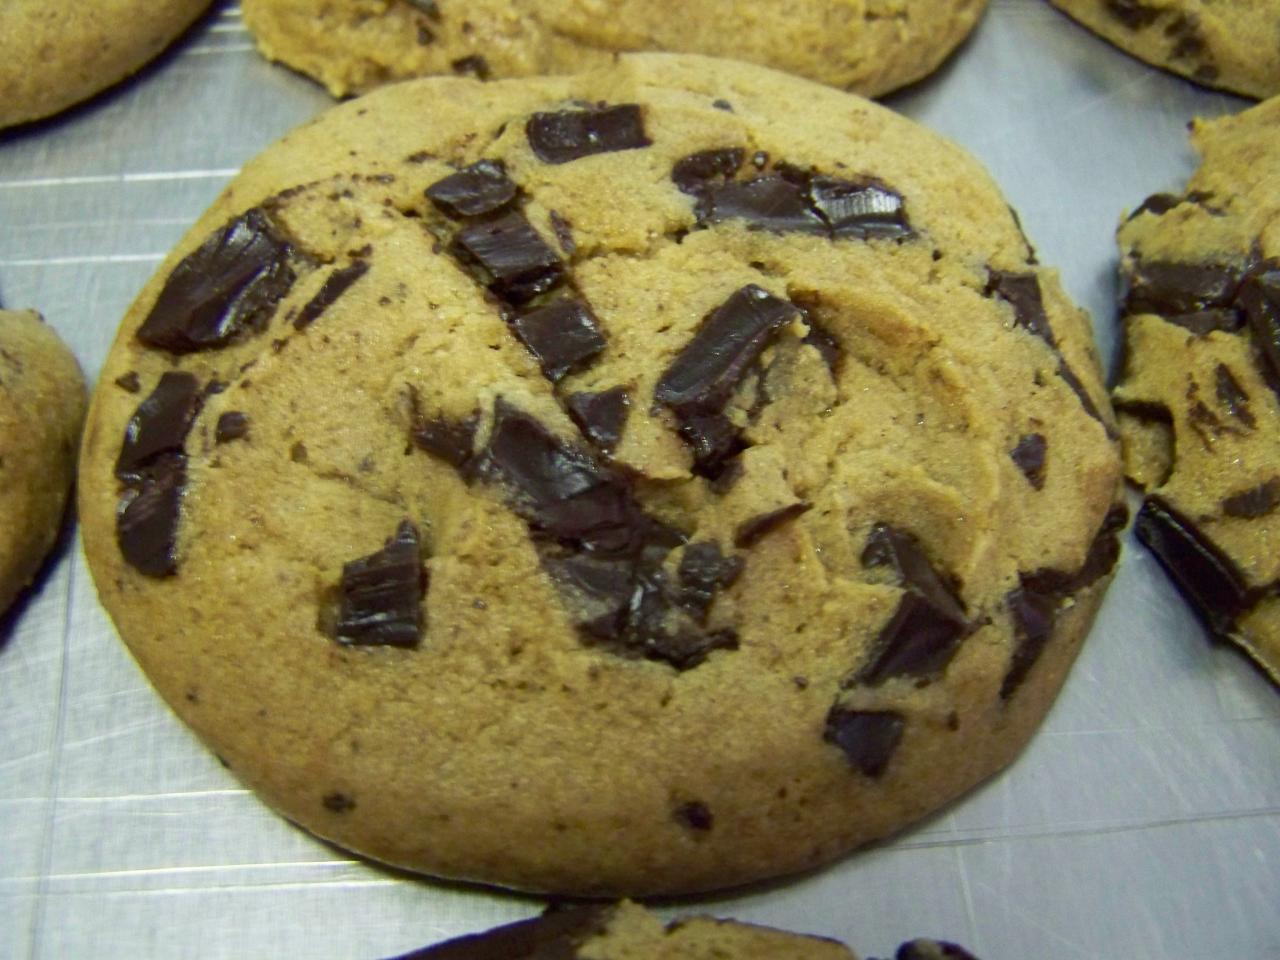 Gourmet Chocolate Chunk Cookies